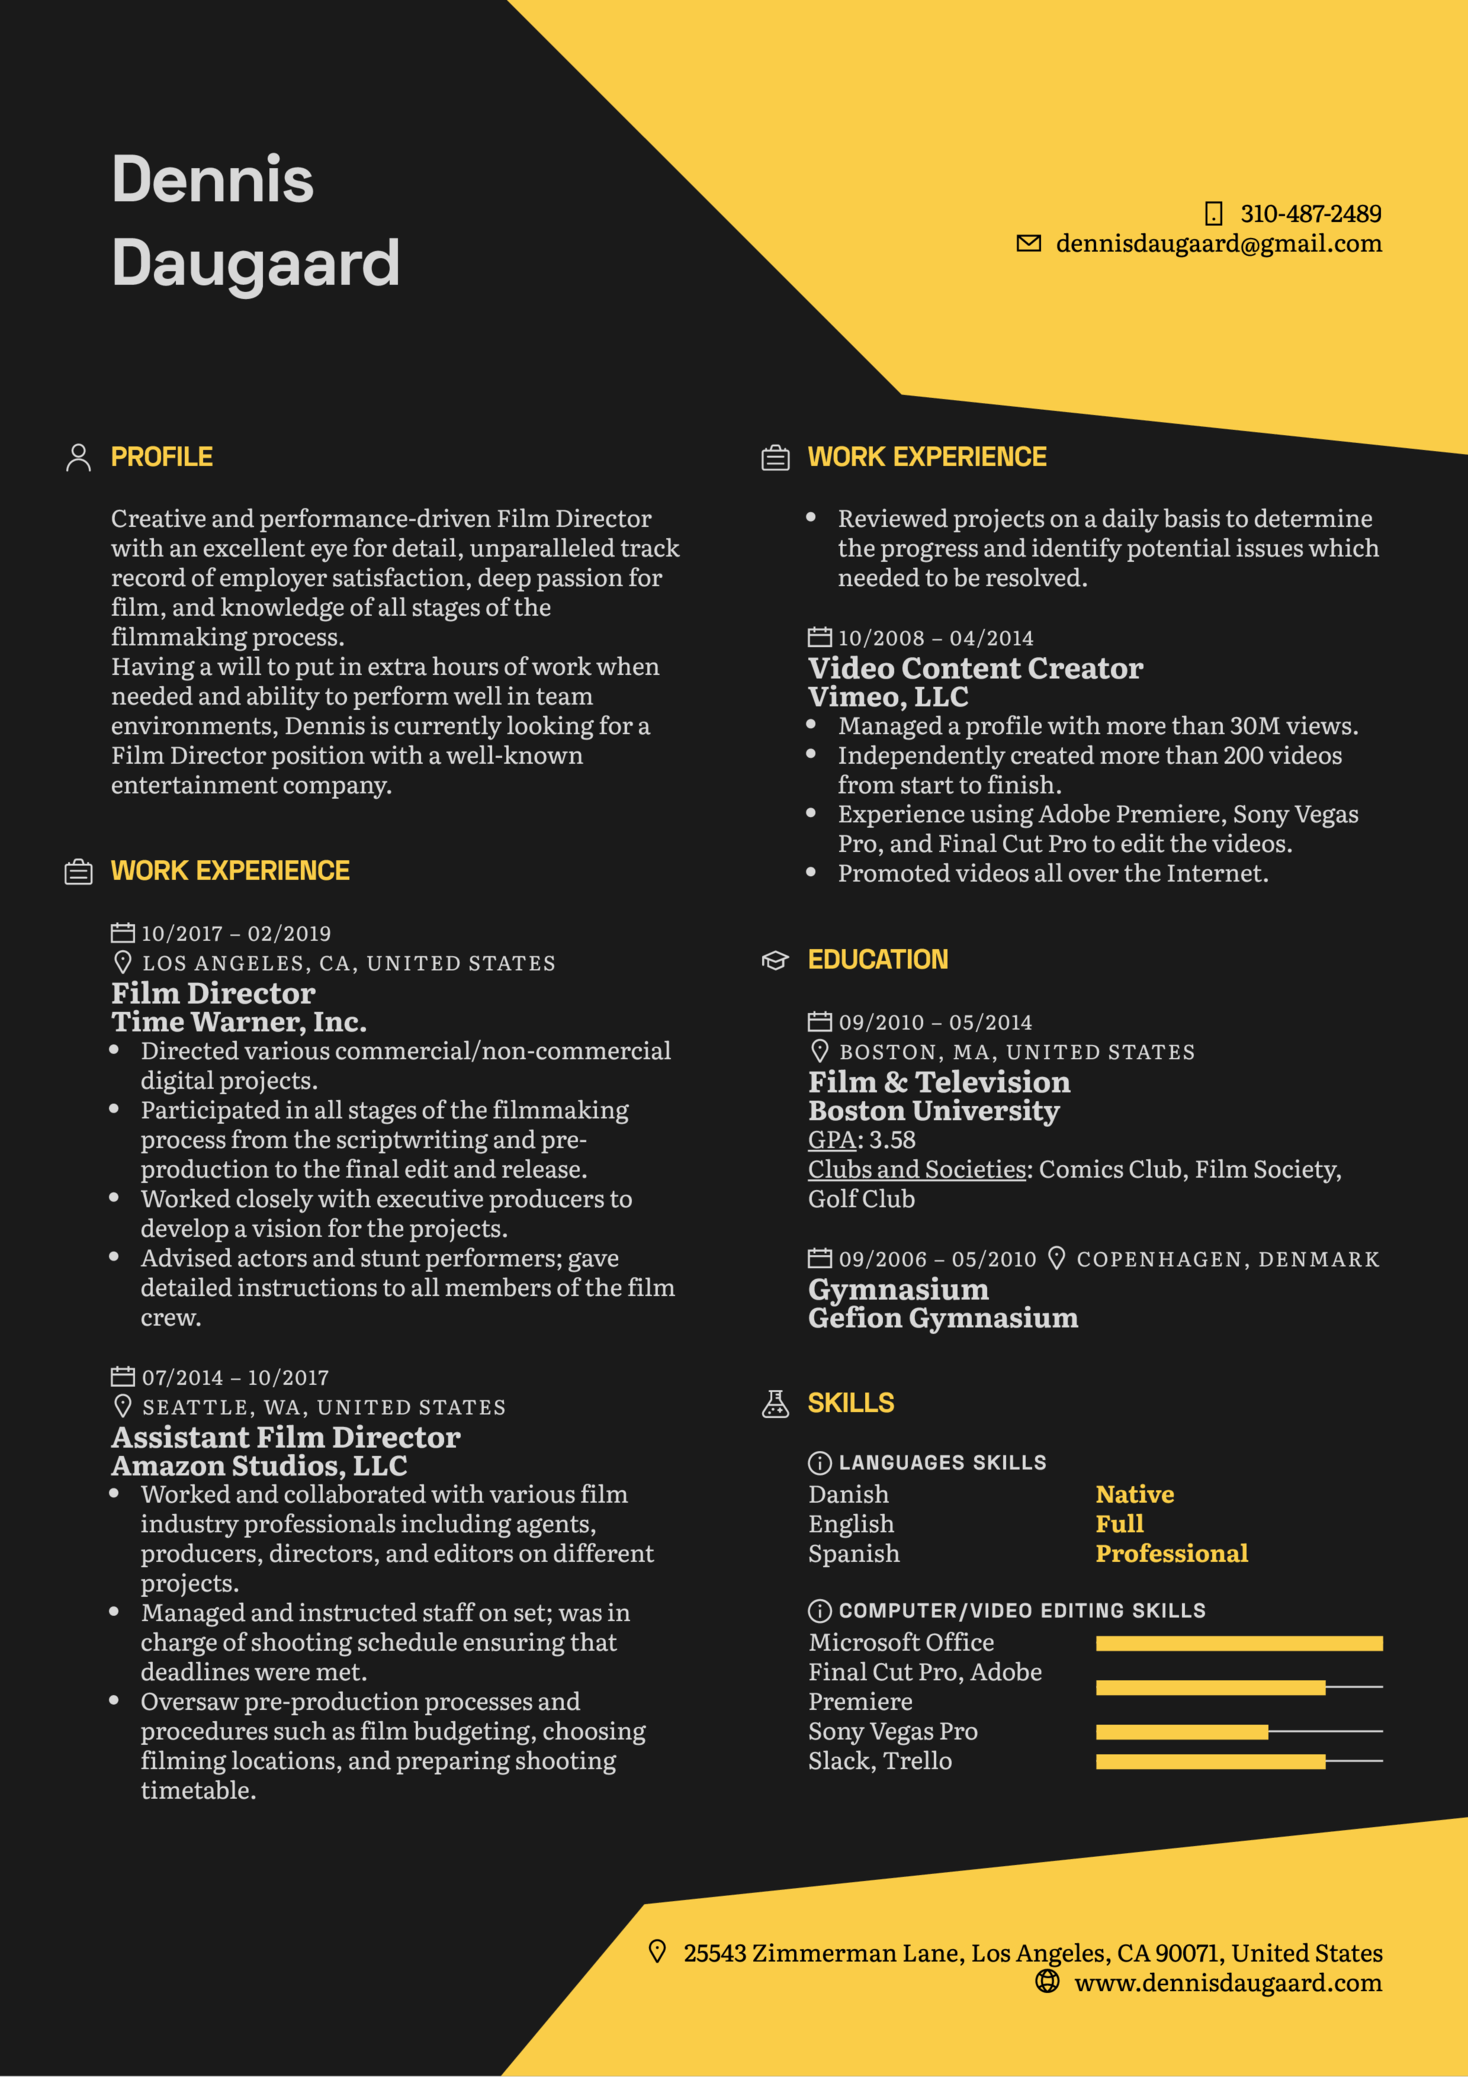 Film Director Resume Template (parte 1)